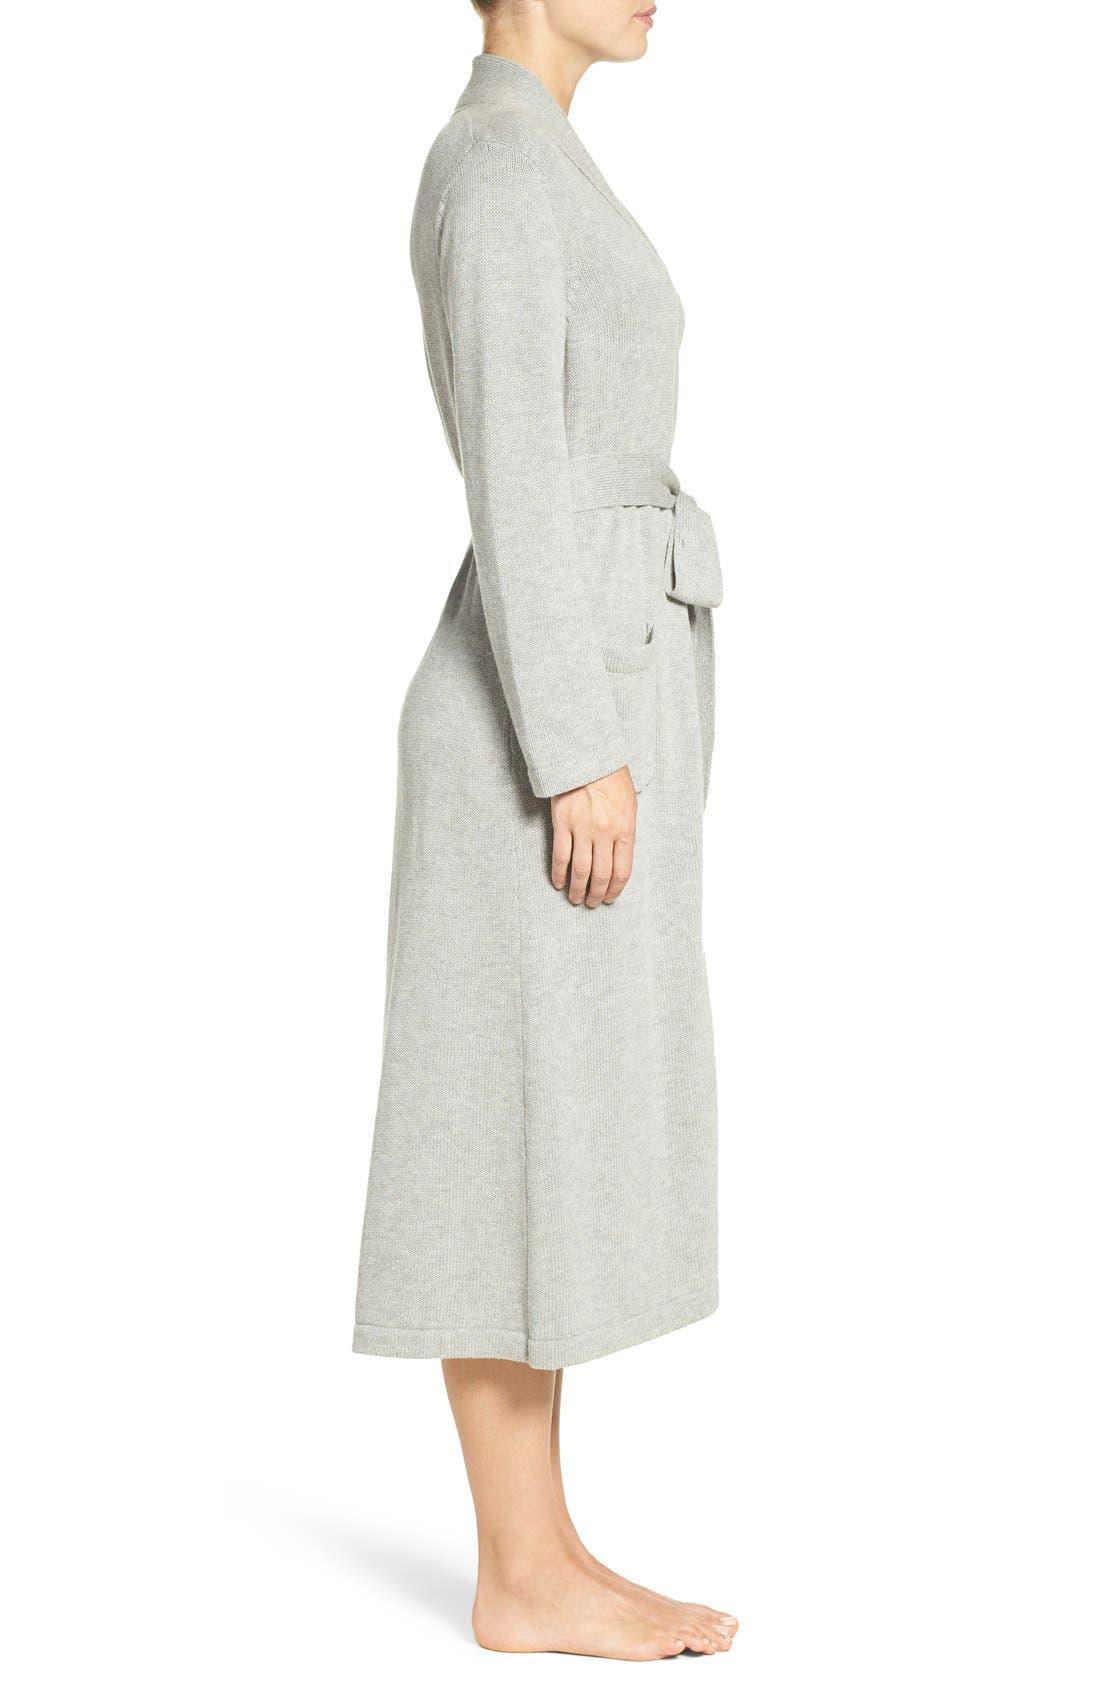 'Ballet' Knit Cotton Blend Robe,                             Alternate thumbnail 4, color,